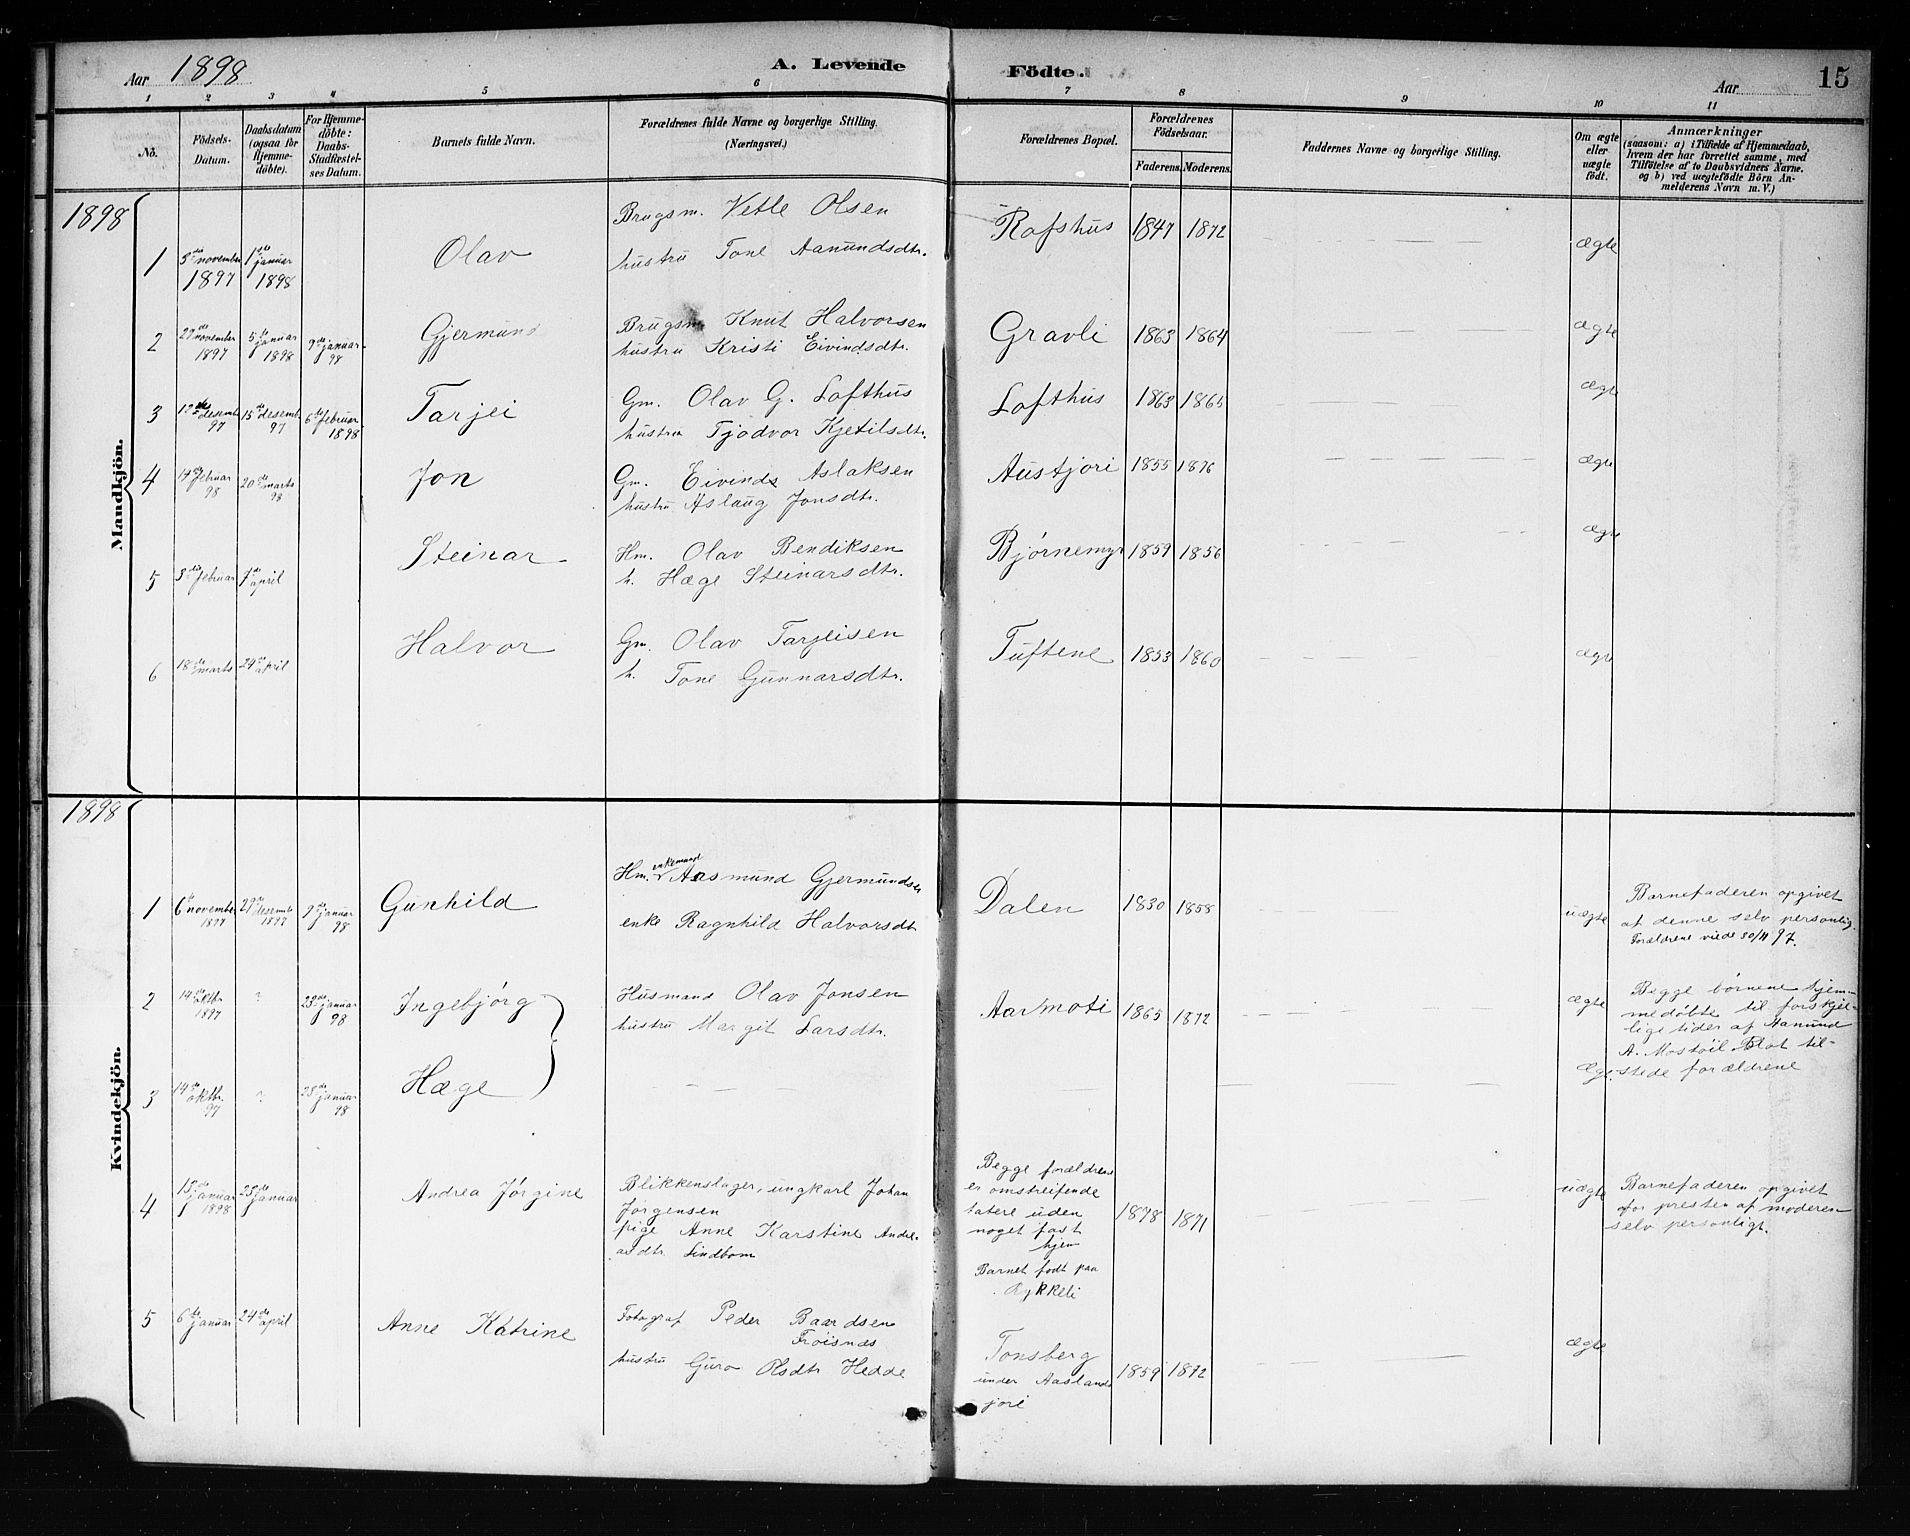 SAKO, Mo kirkebøker, G/Ga/L0002: Klokkerbok nr. I 2, 1892-1914, s. 15